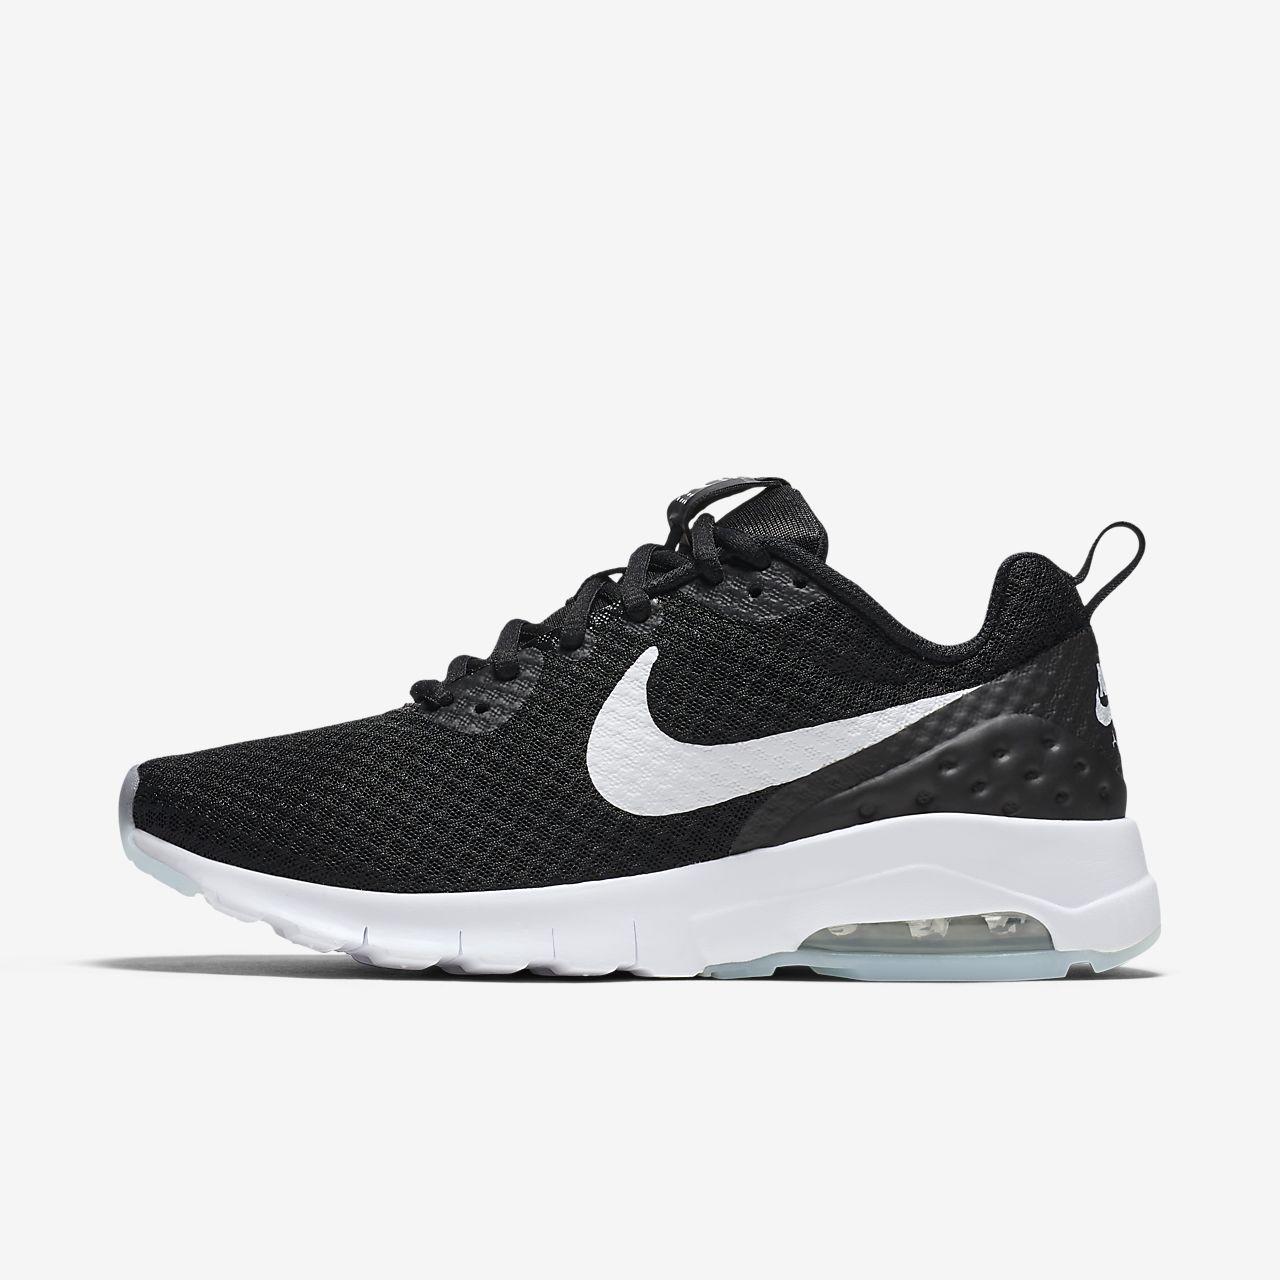 d3269225499 Γυναικείο παπούτσι Nike Air Max Motion Low. Nike.com GR